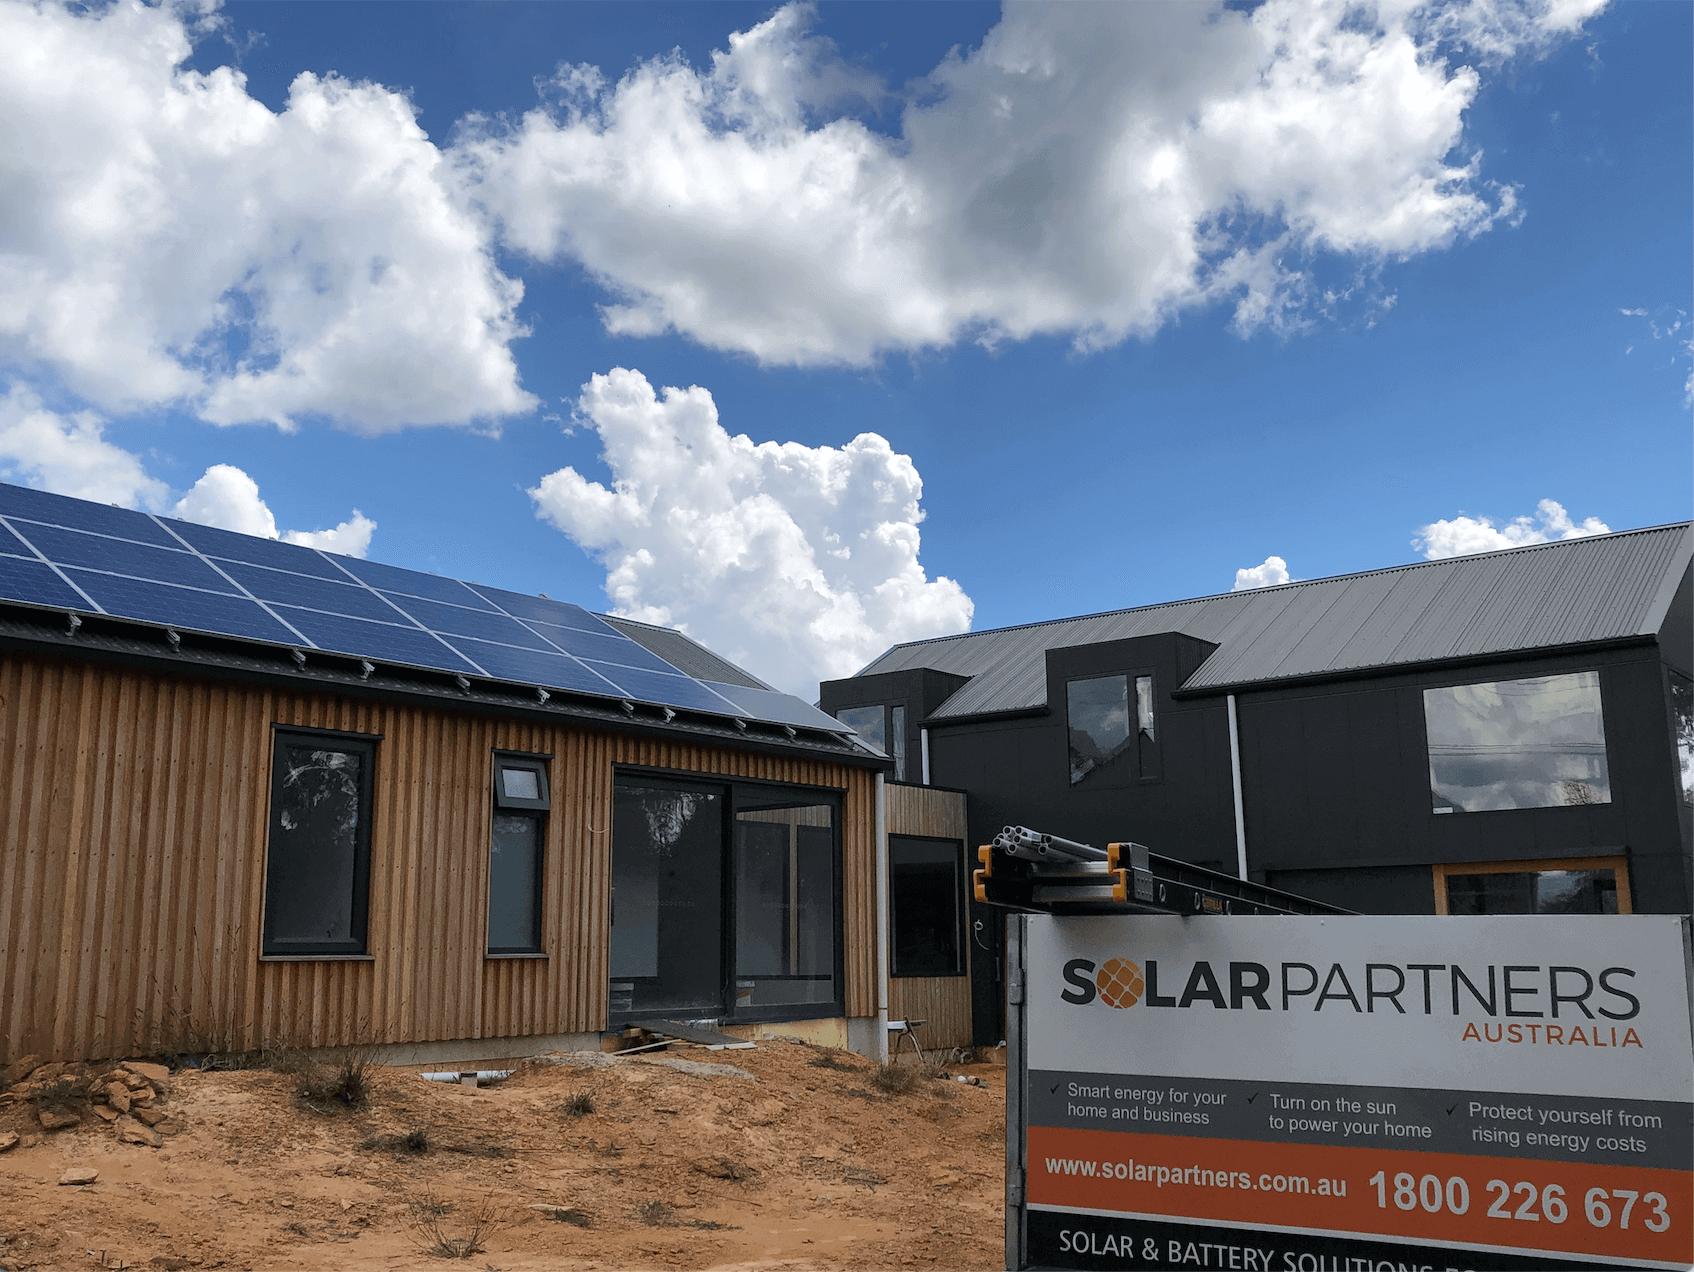 solarpartners